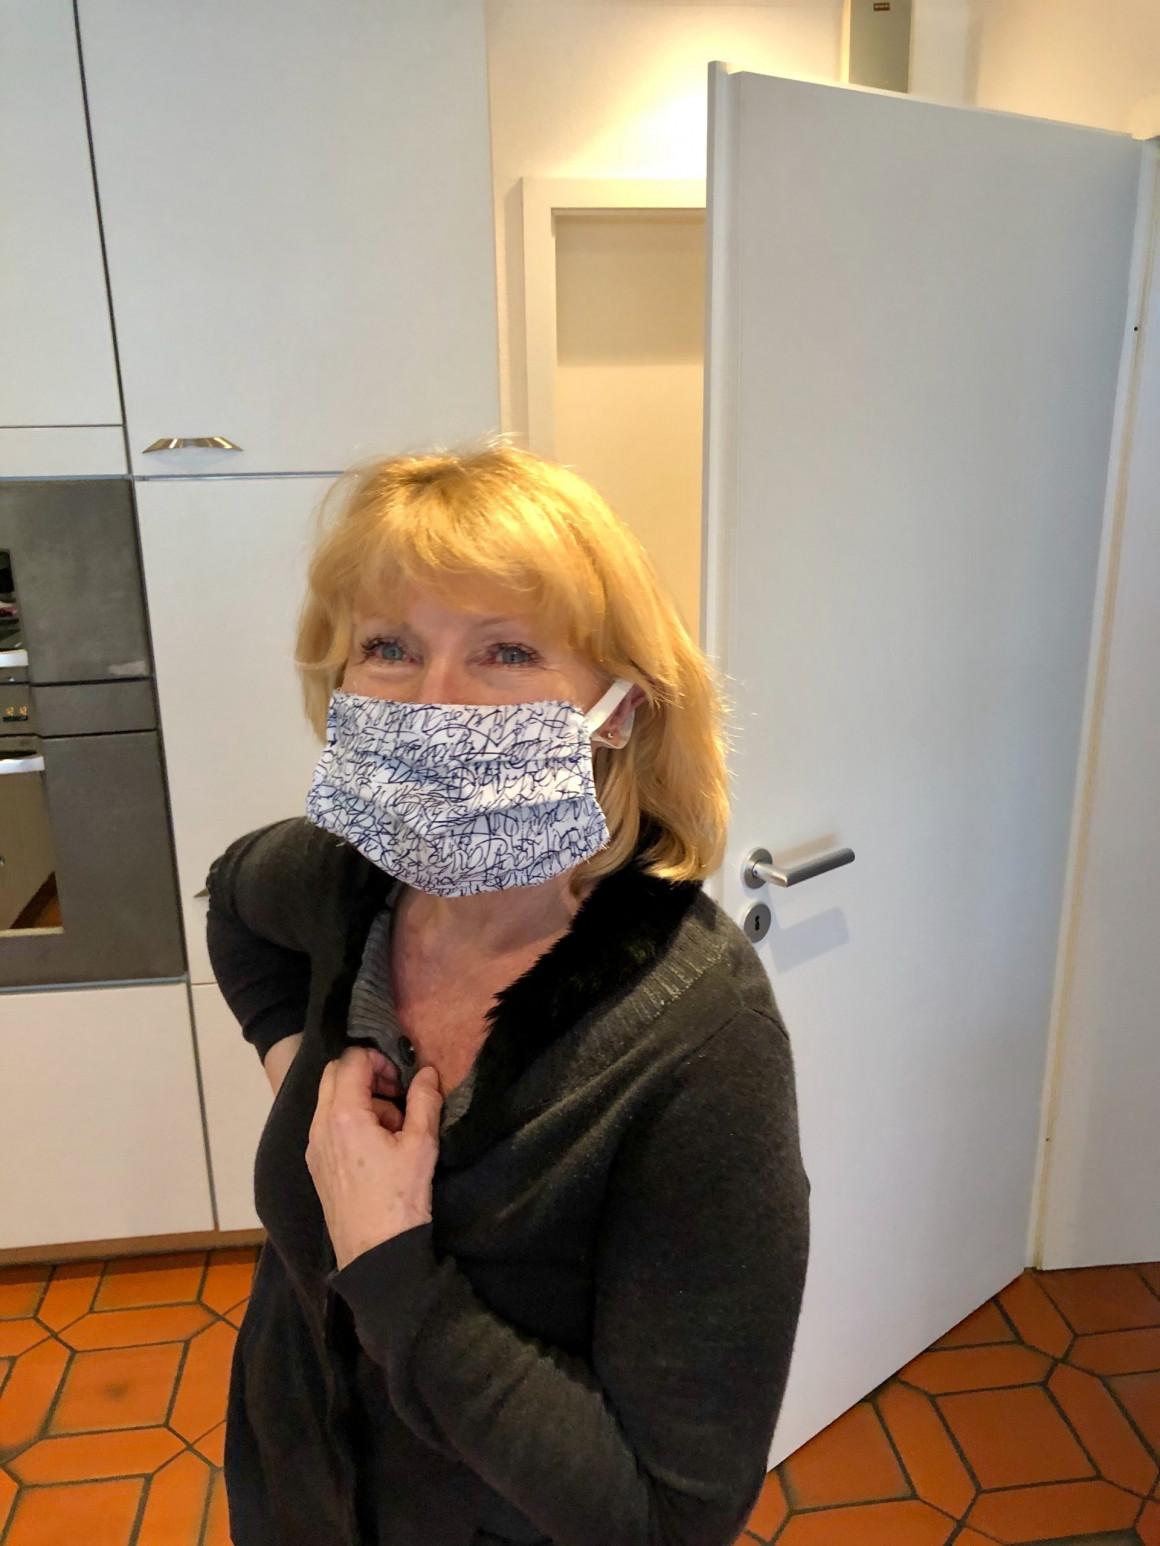 Mundschutz gegen Corona - Selbermachen